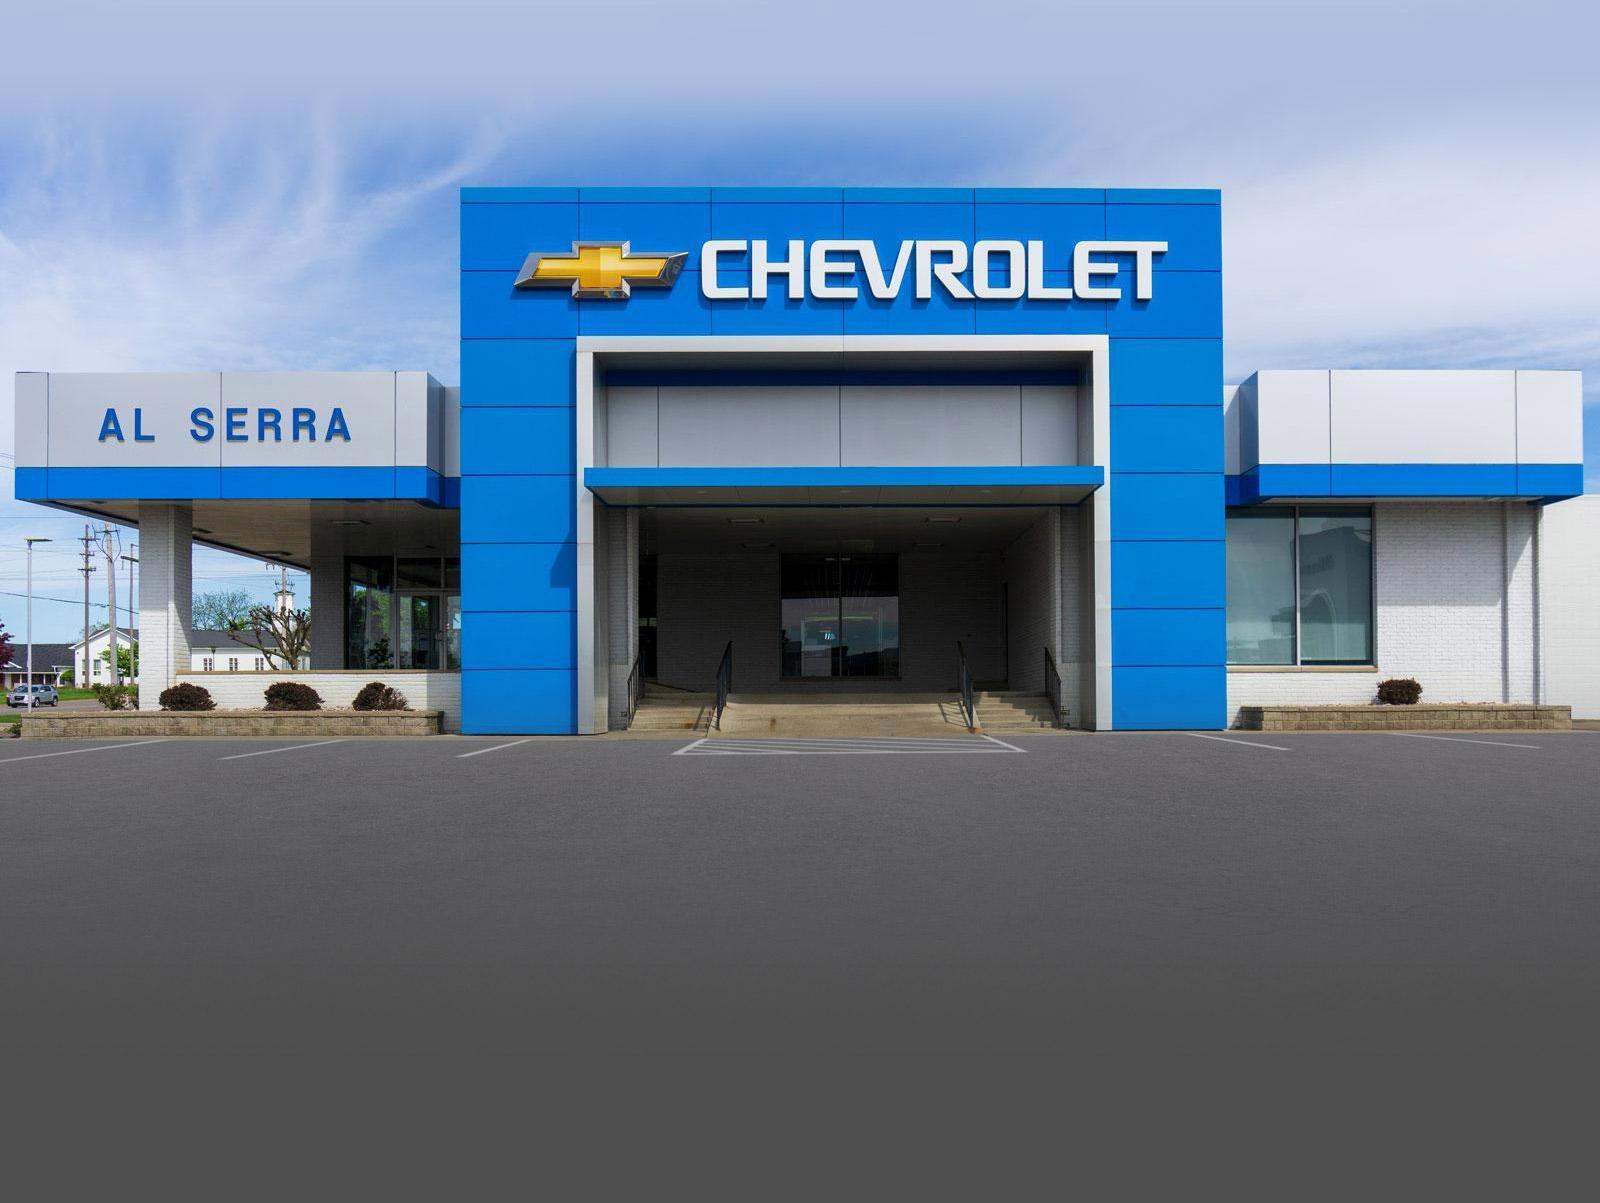 Al Serra Chevrolet in GRAND BLANC, MI | New & Used Dealer Serving Flint, Davison, and Fenton, MI Chevrolet Drivers